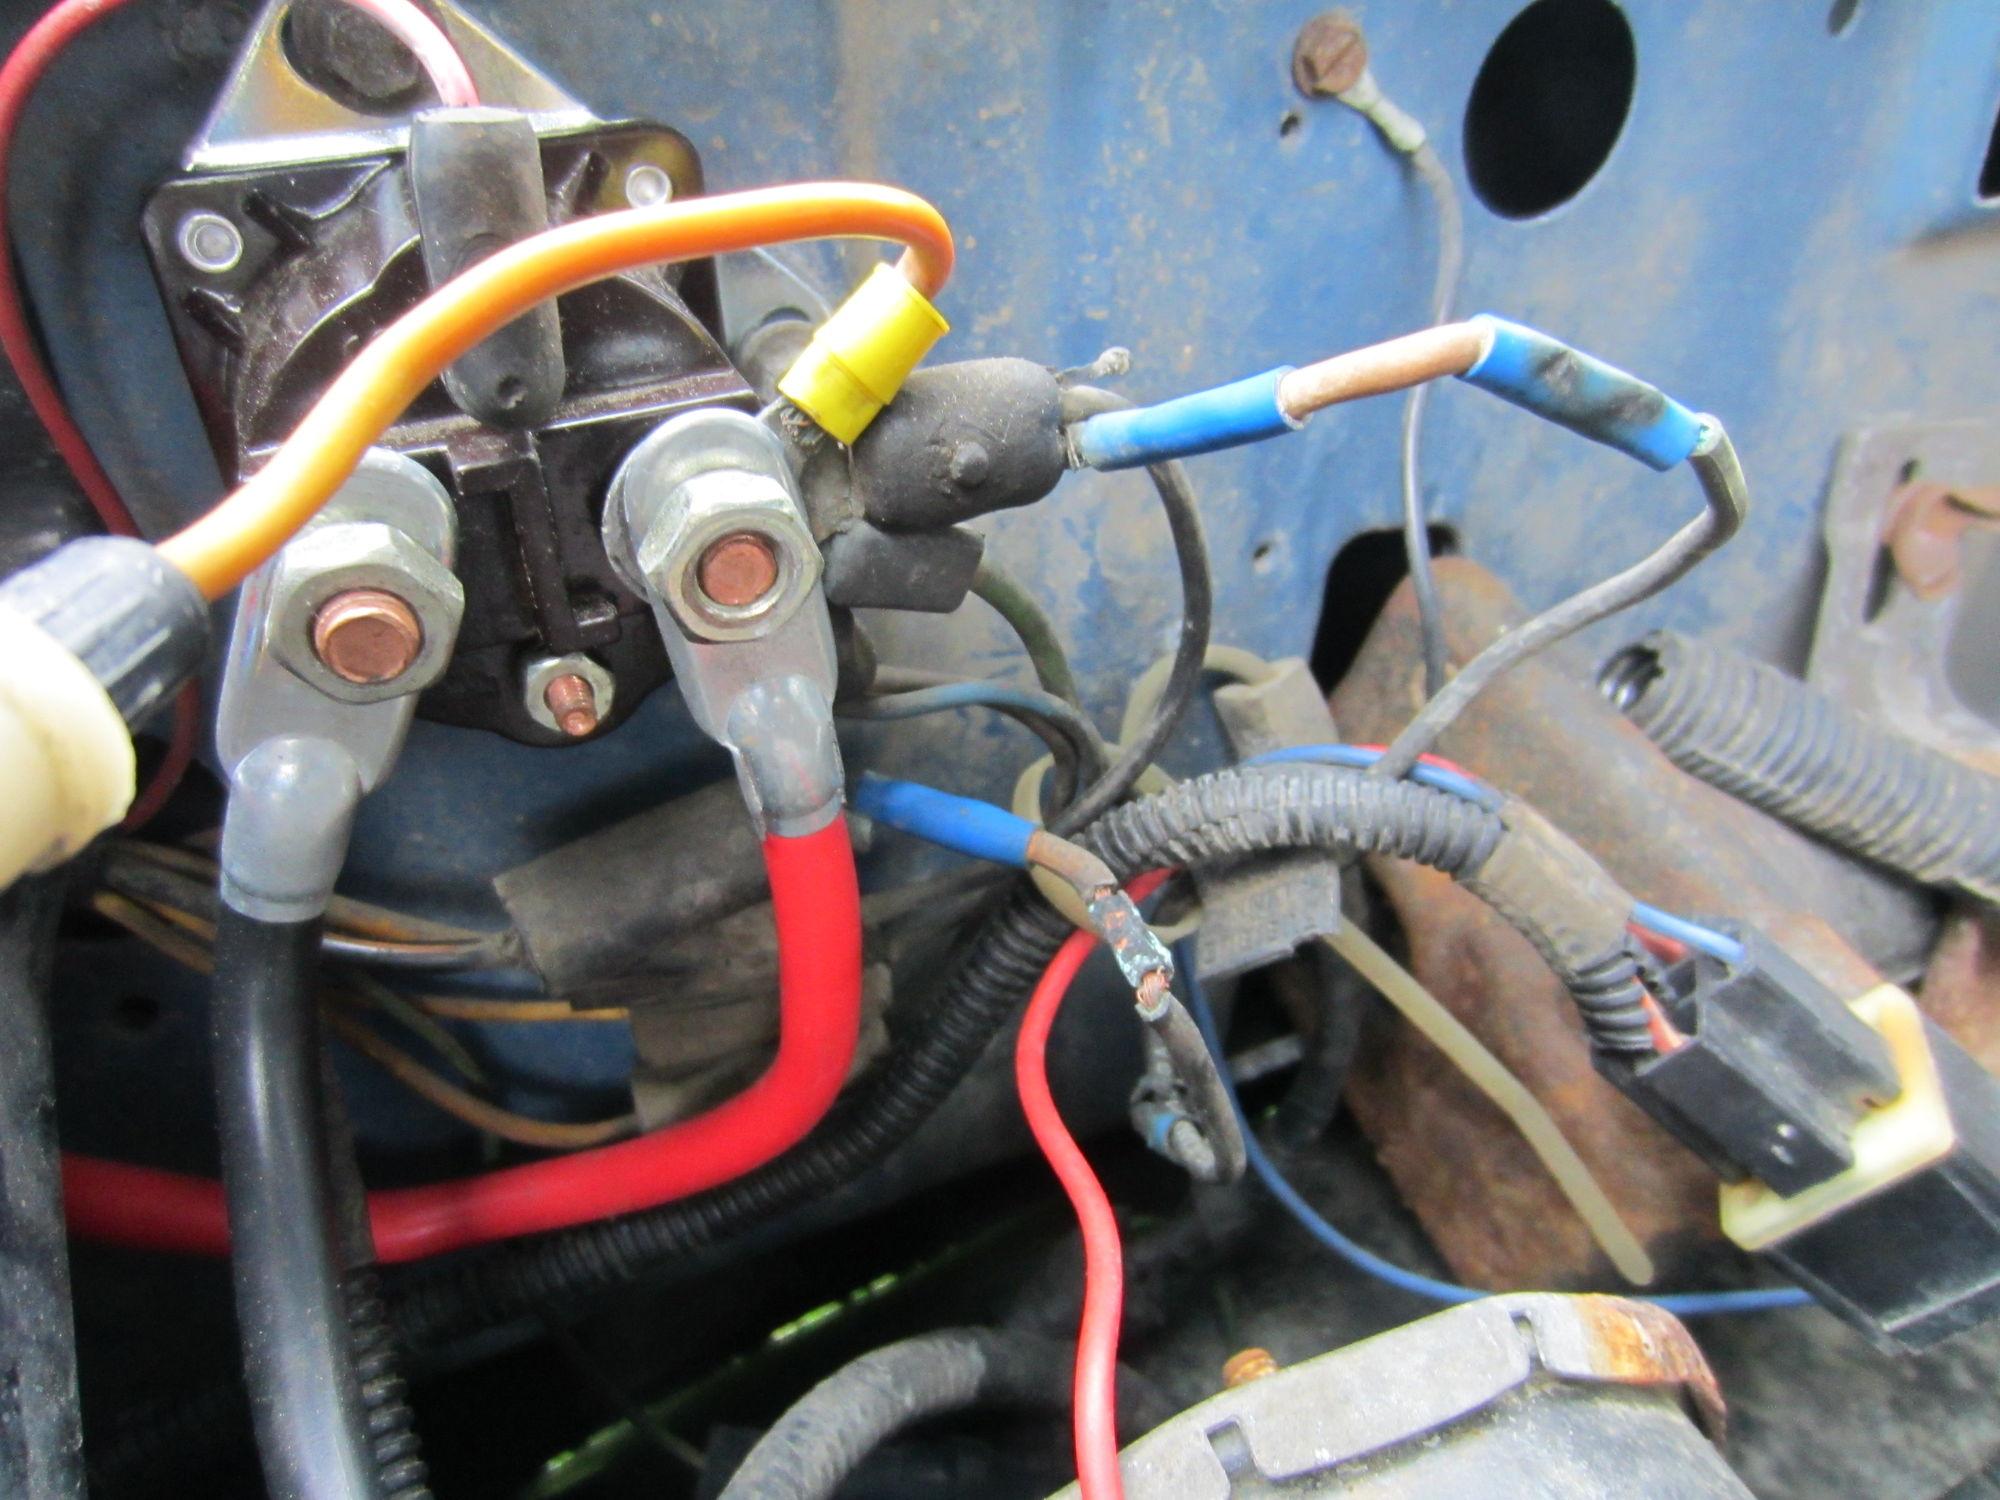 hight resolution of 1990 jeep starter solenoid wiring diagram 12 2008 jeep commander star jeep alternator wiring